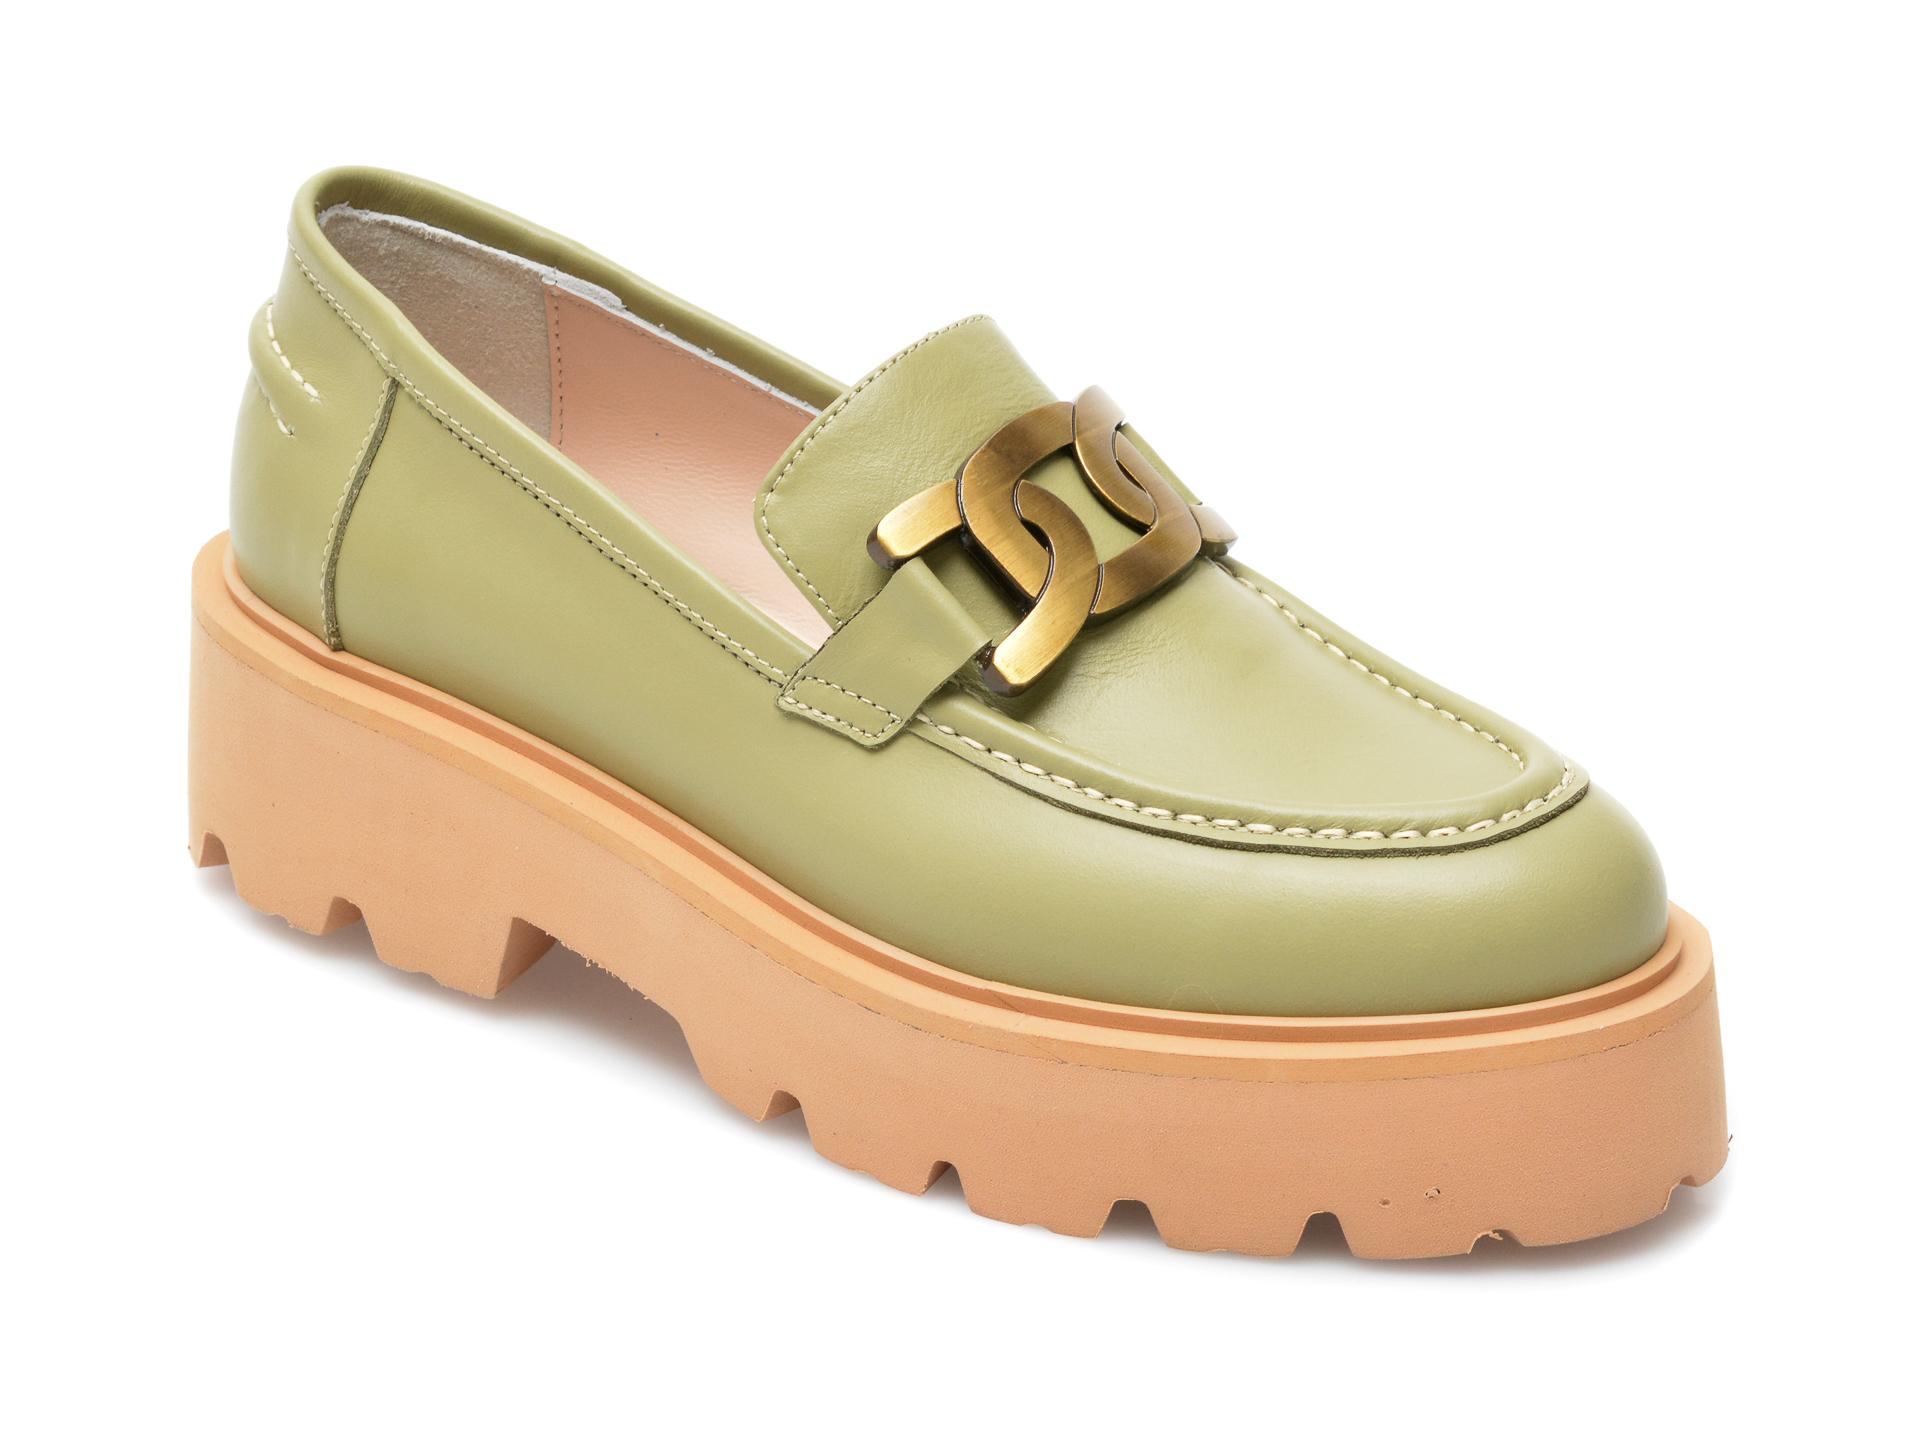 Pantofi EPICA verzi, 4380681, din piele naturala imagine otter.ro 2021